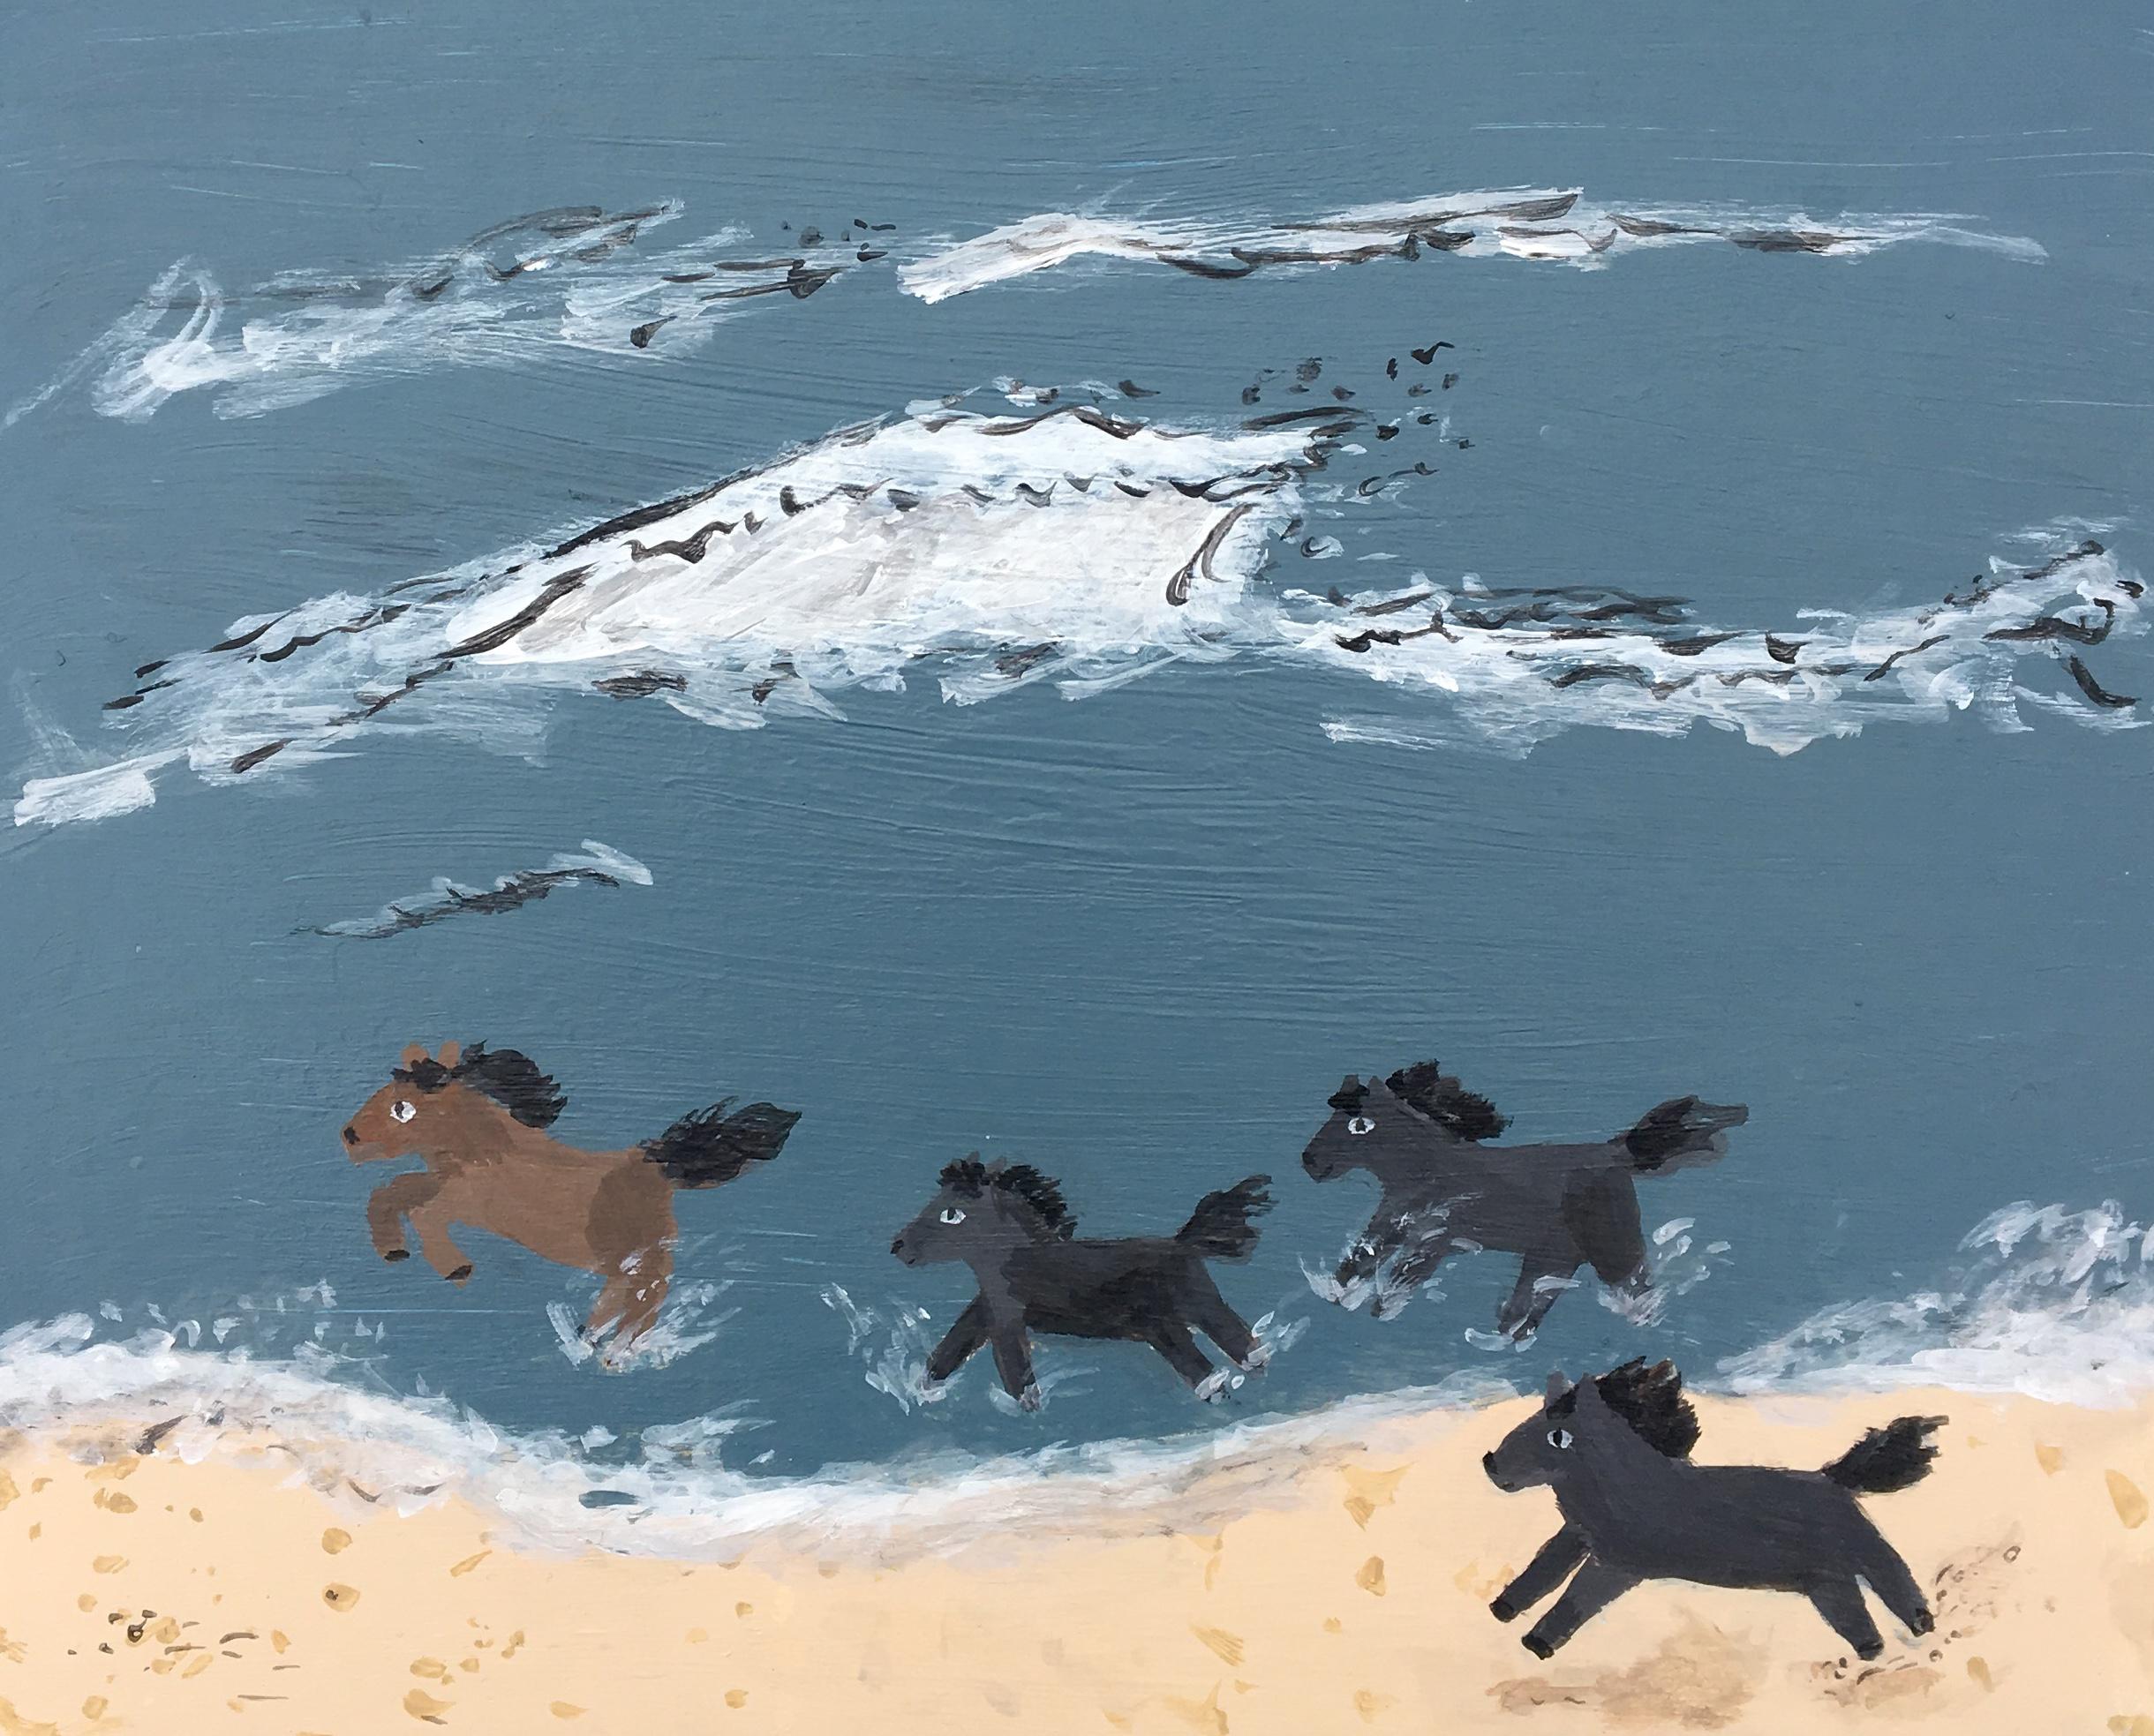 Wild Horses Acrylic Painting on Wood Panel $400